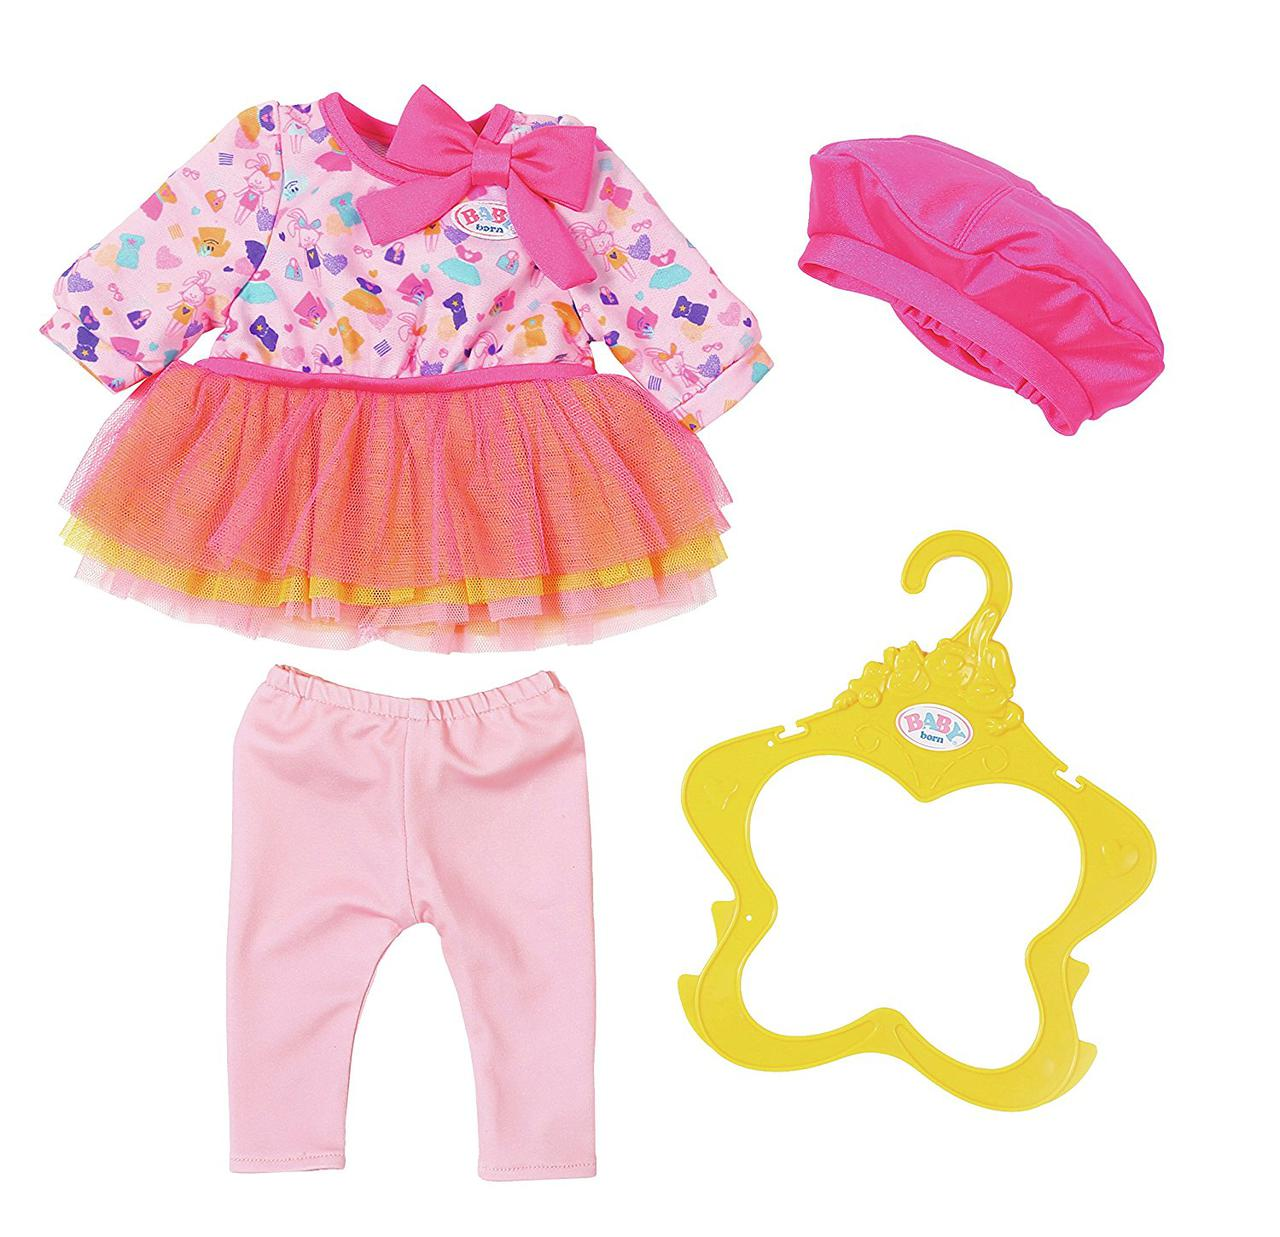 Одежда для кукол Беби Борн комплект модный стиль розовый Baby Born Fashion Collection Zapf Creation 824528